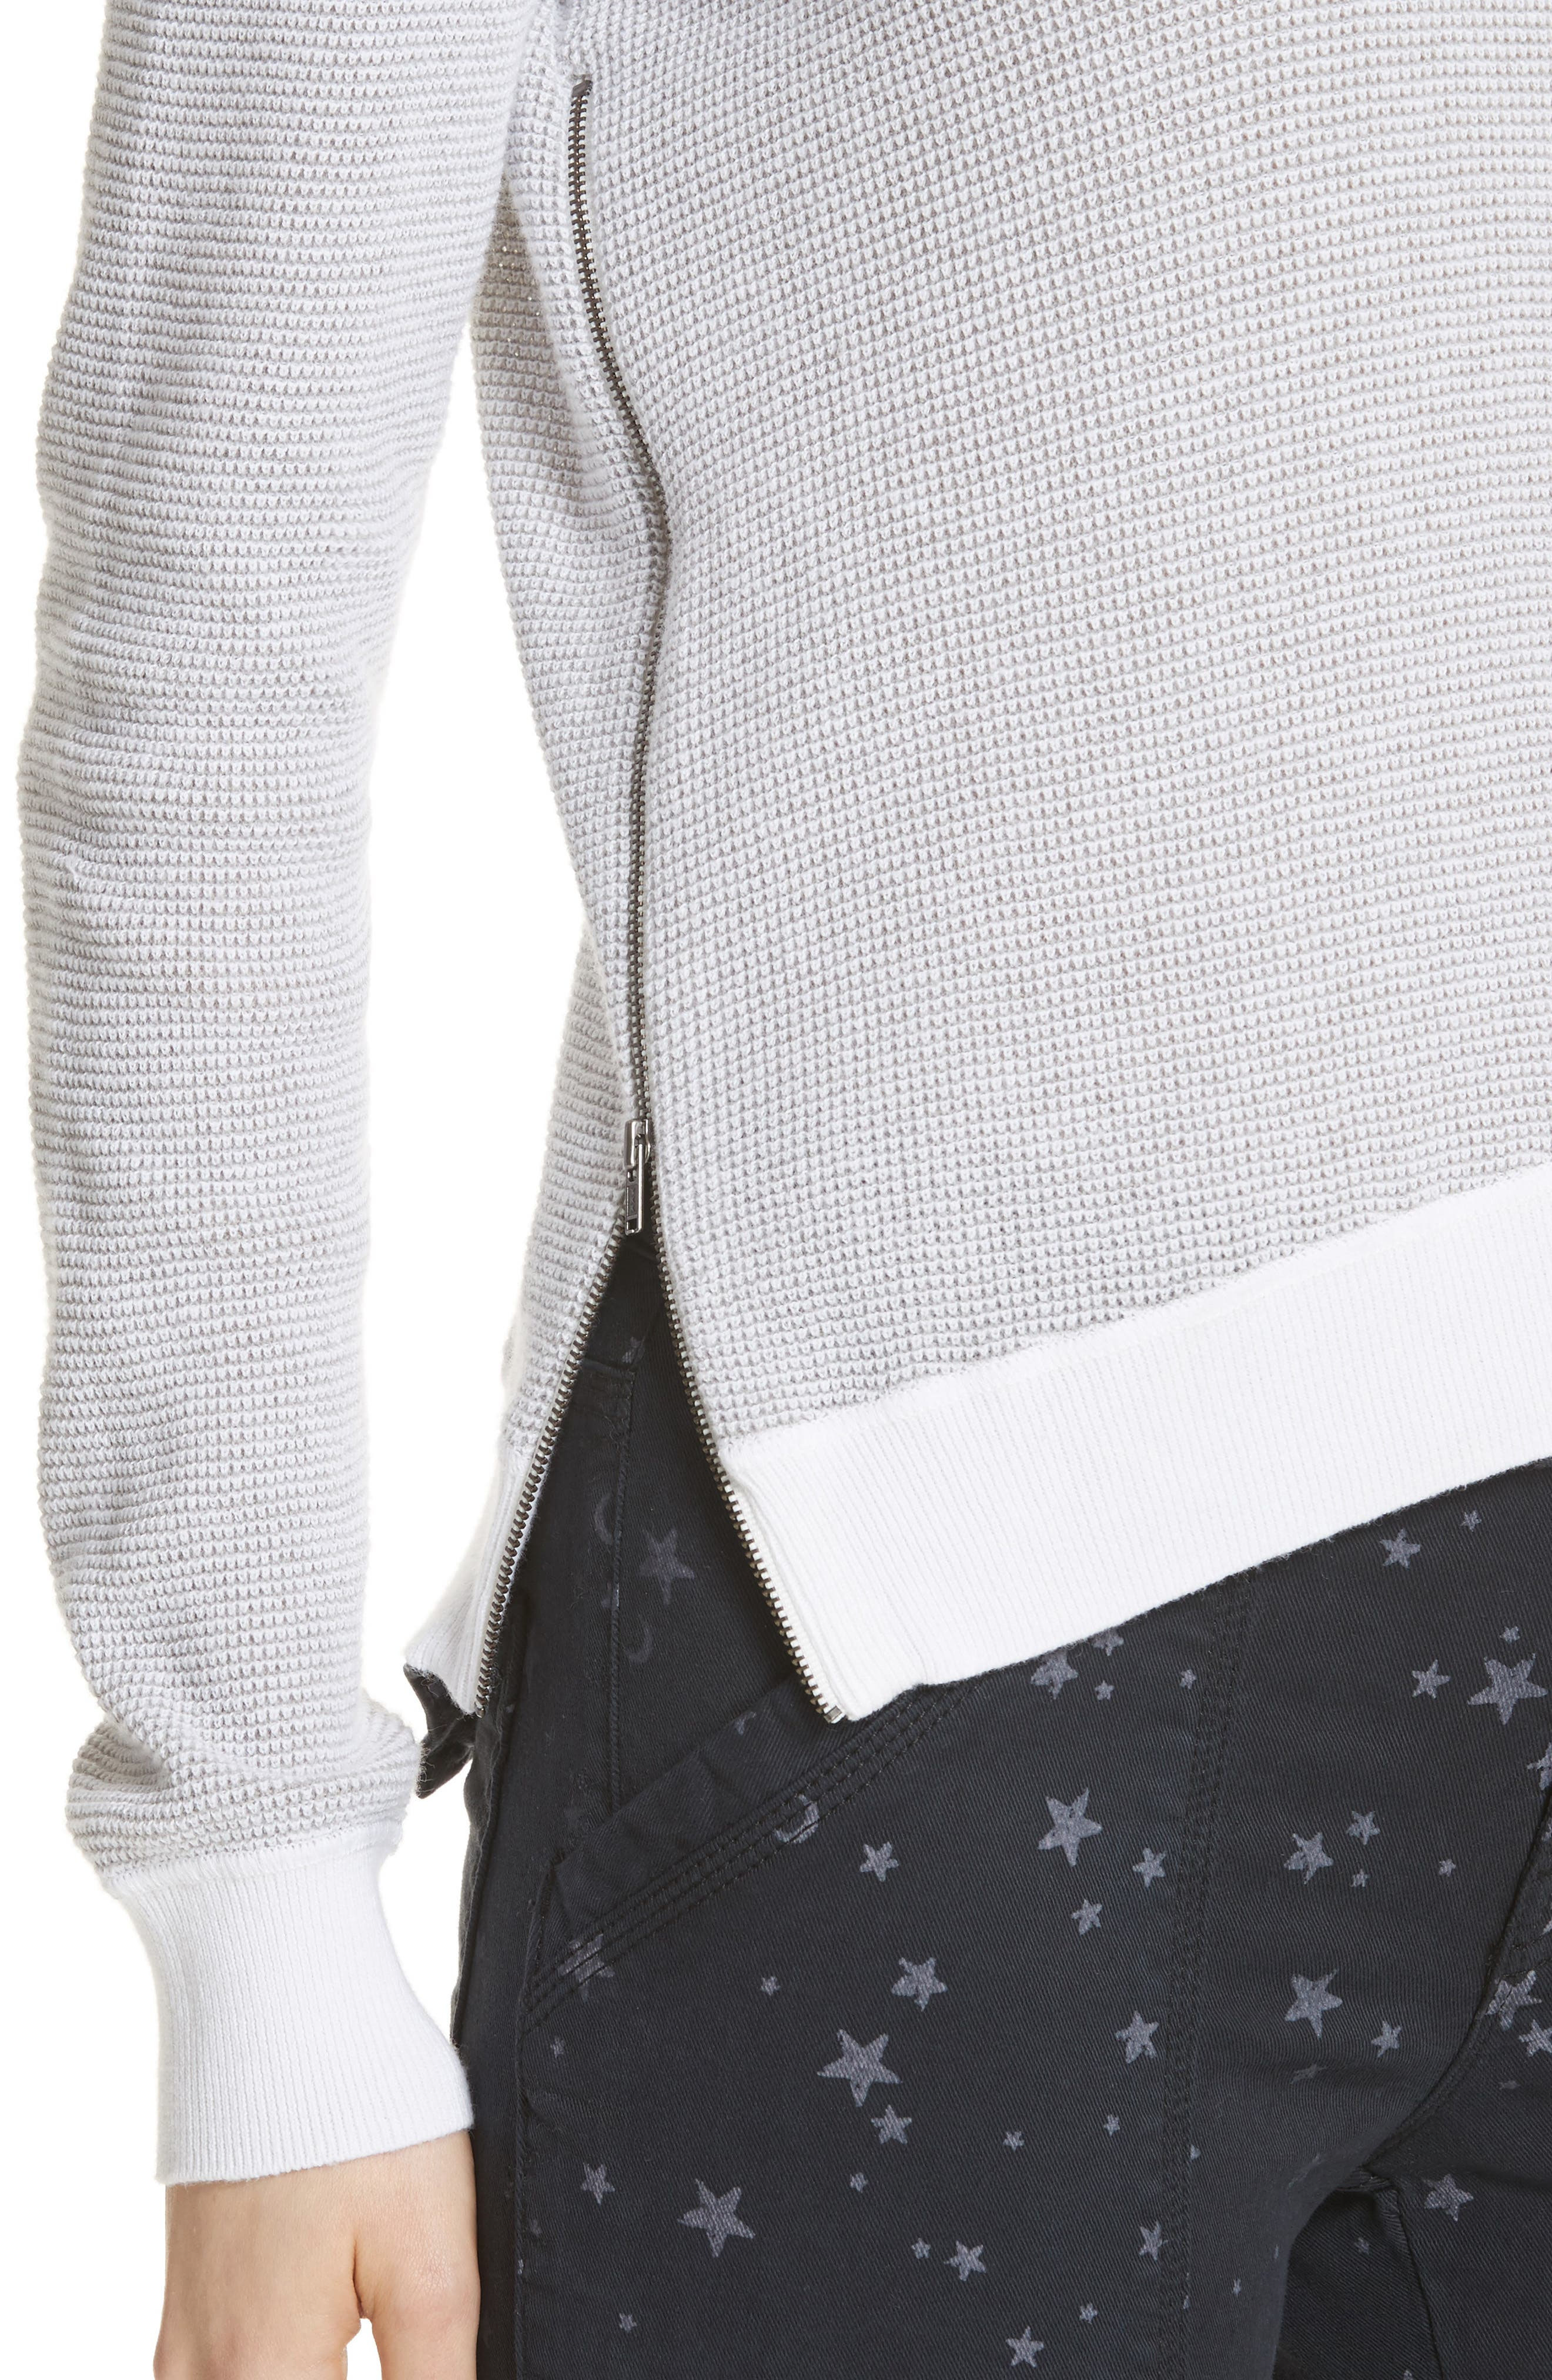 Laurana Cotton & Cashmere Sweater,                             Alternate thumbnail 4, color,